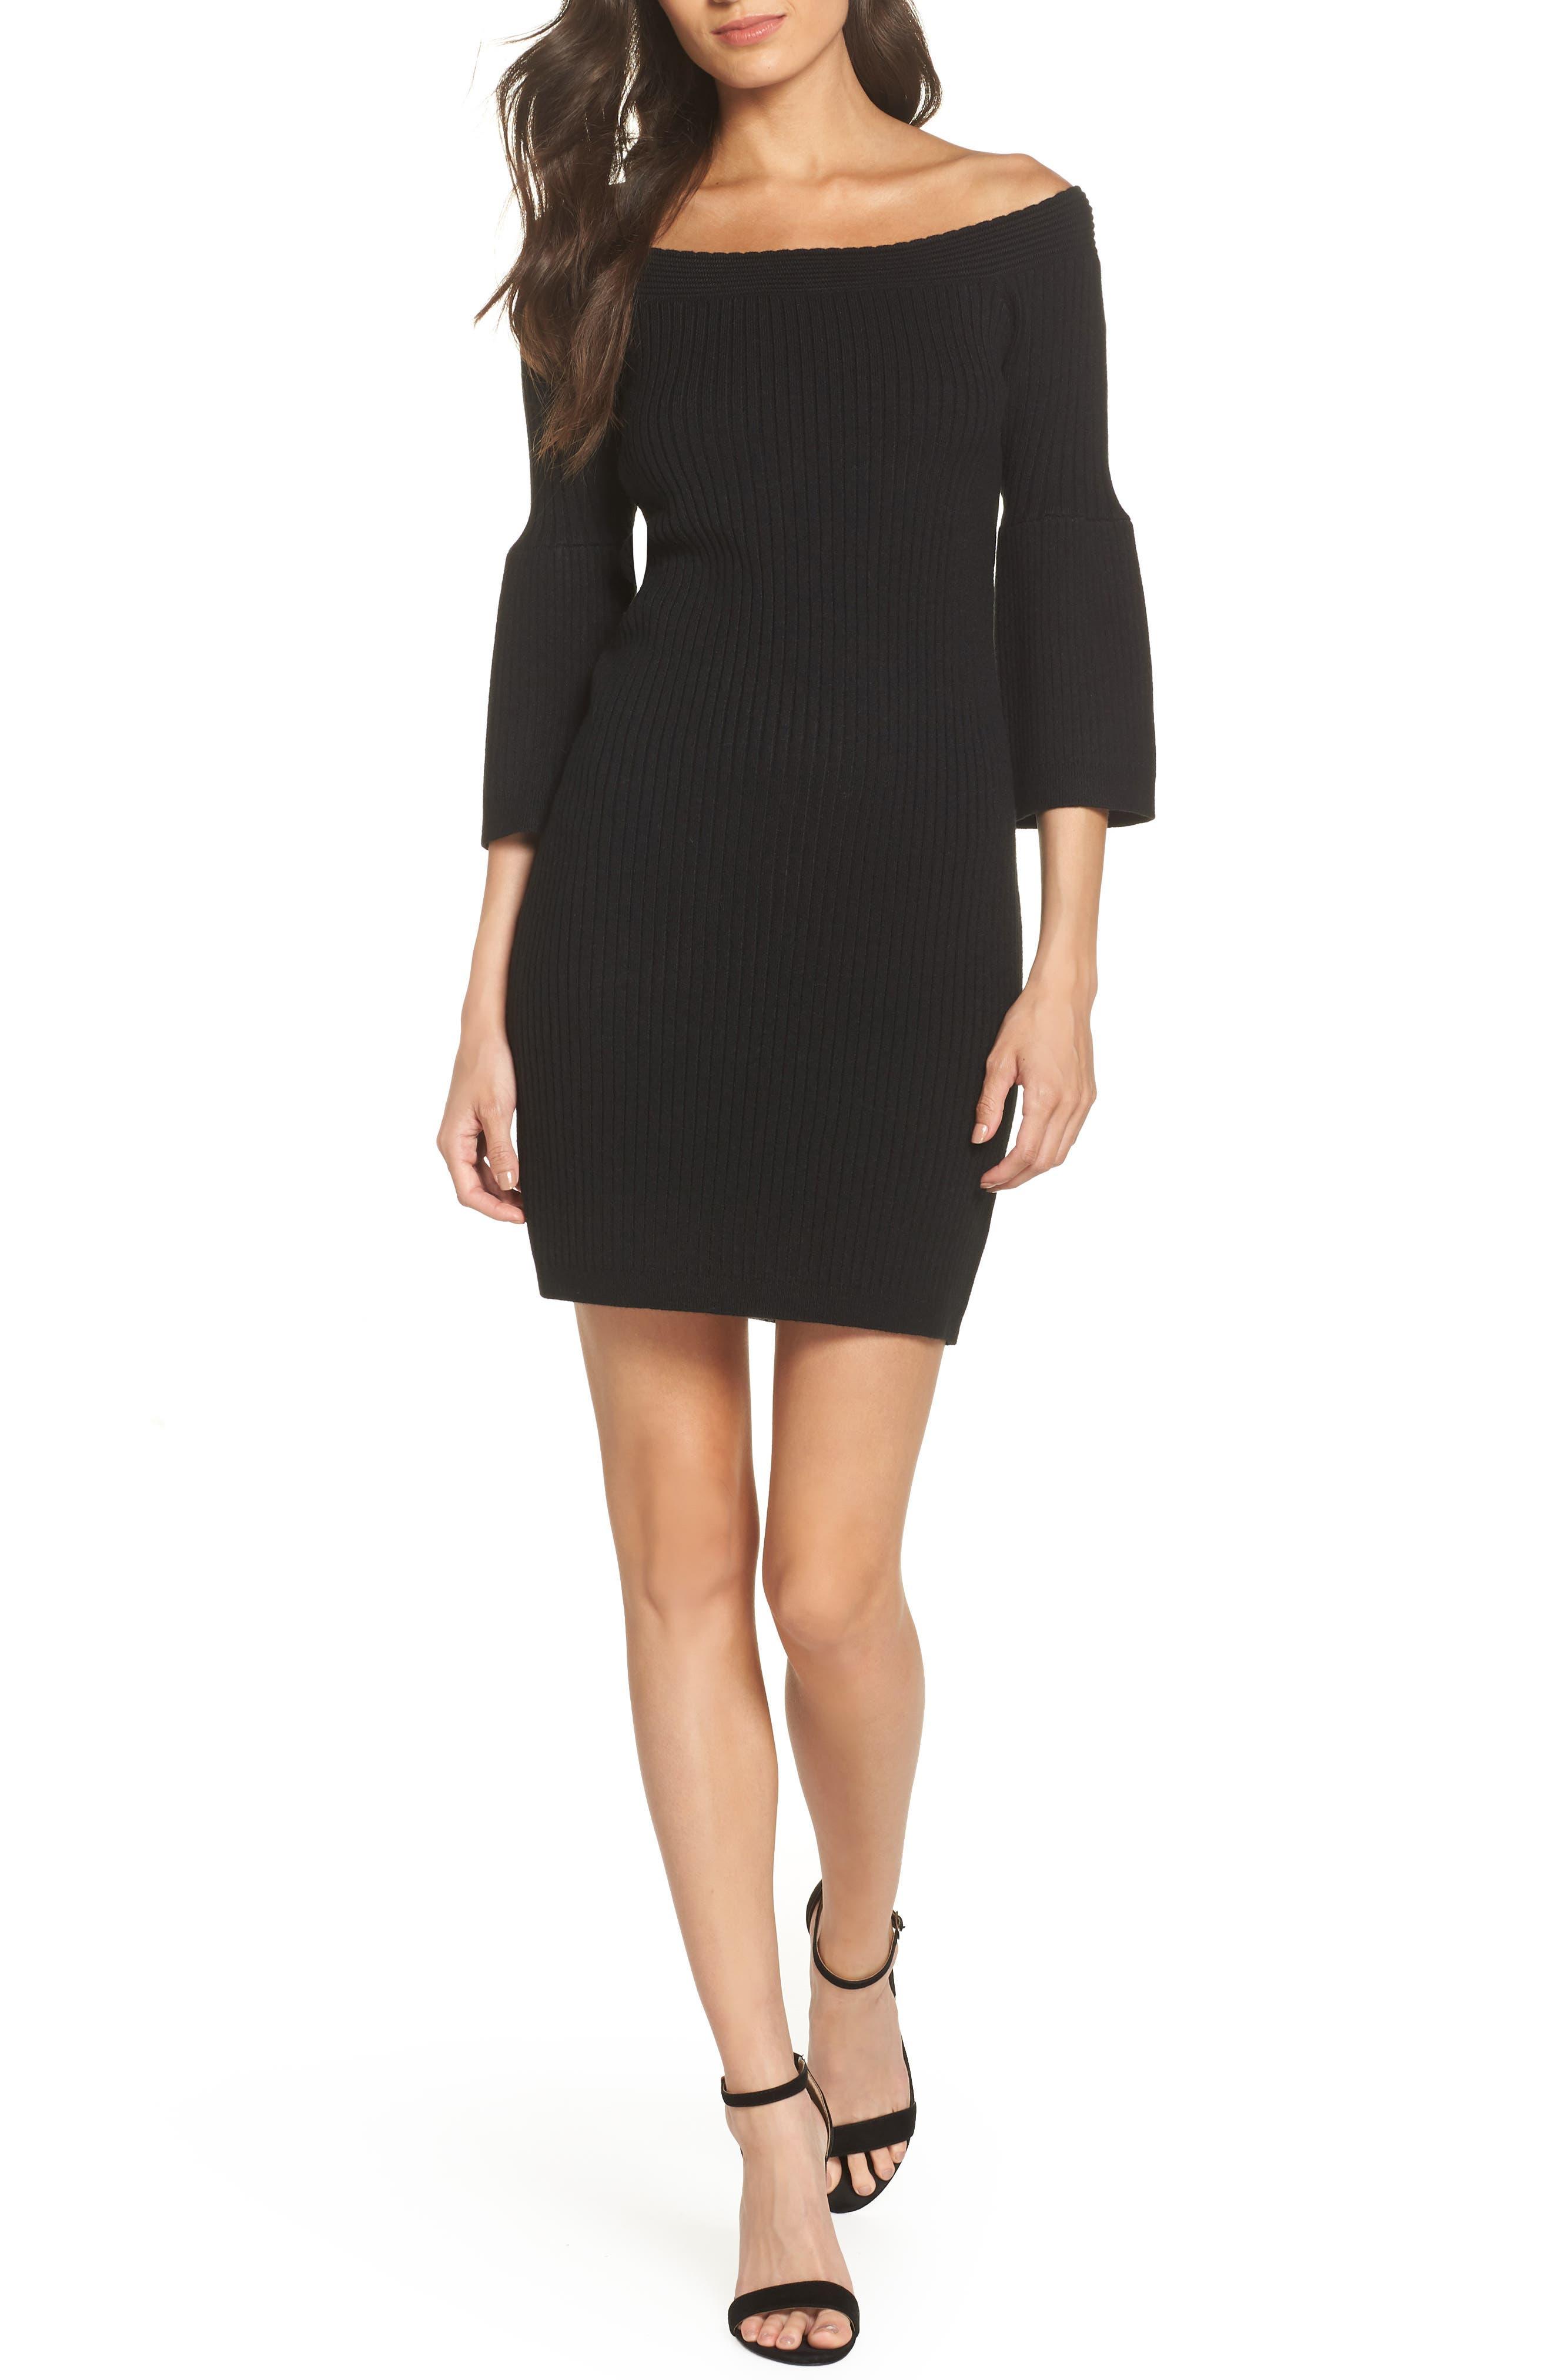 Bb Dakota Once Dance Off The Shoulder Sweater Dress, Black